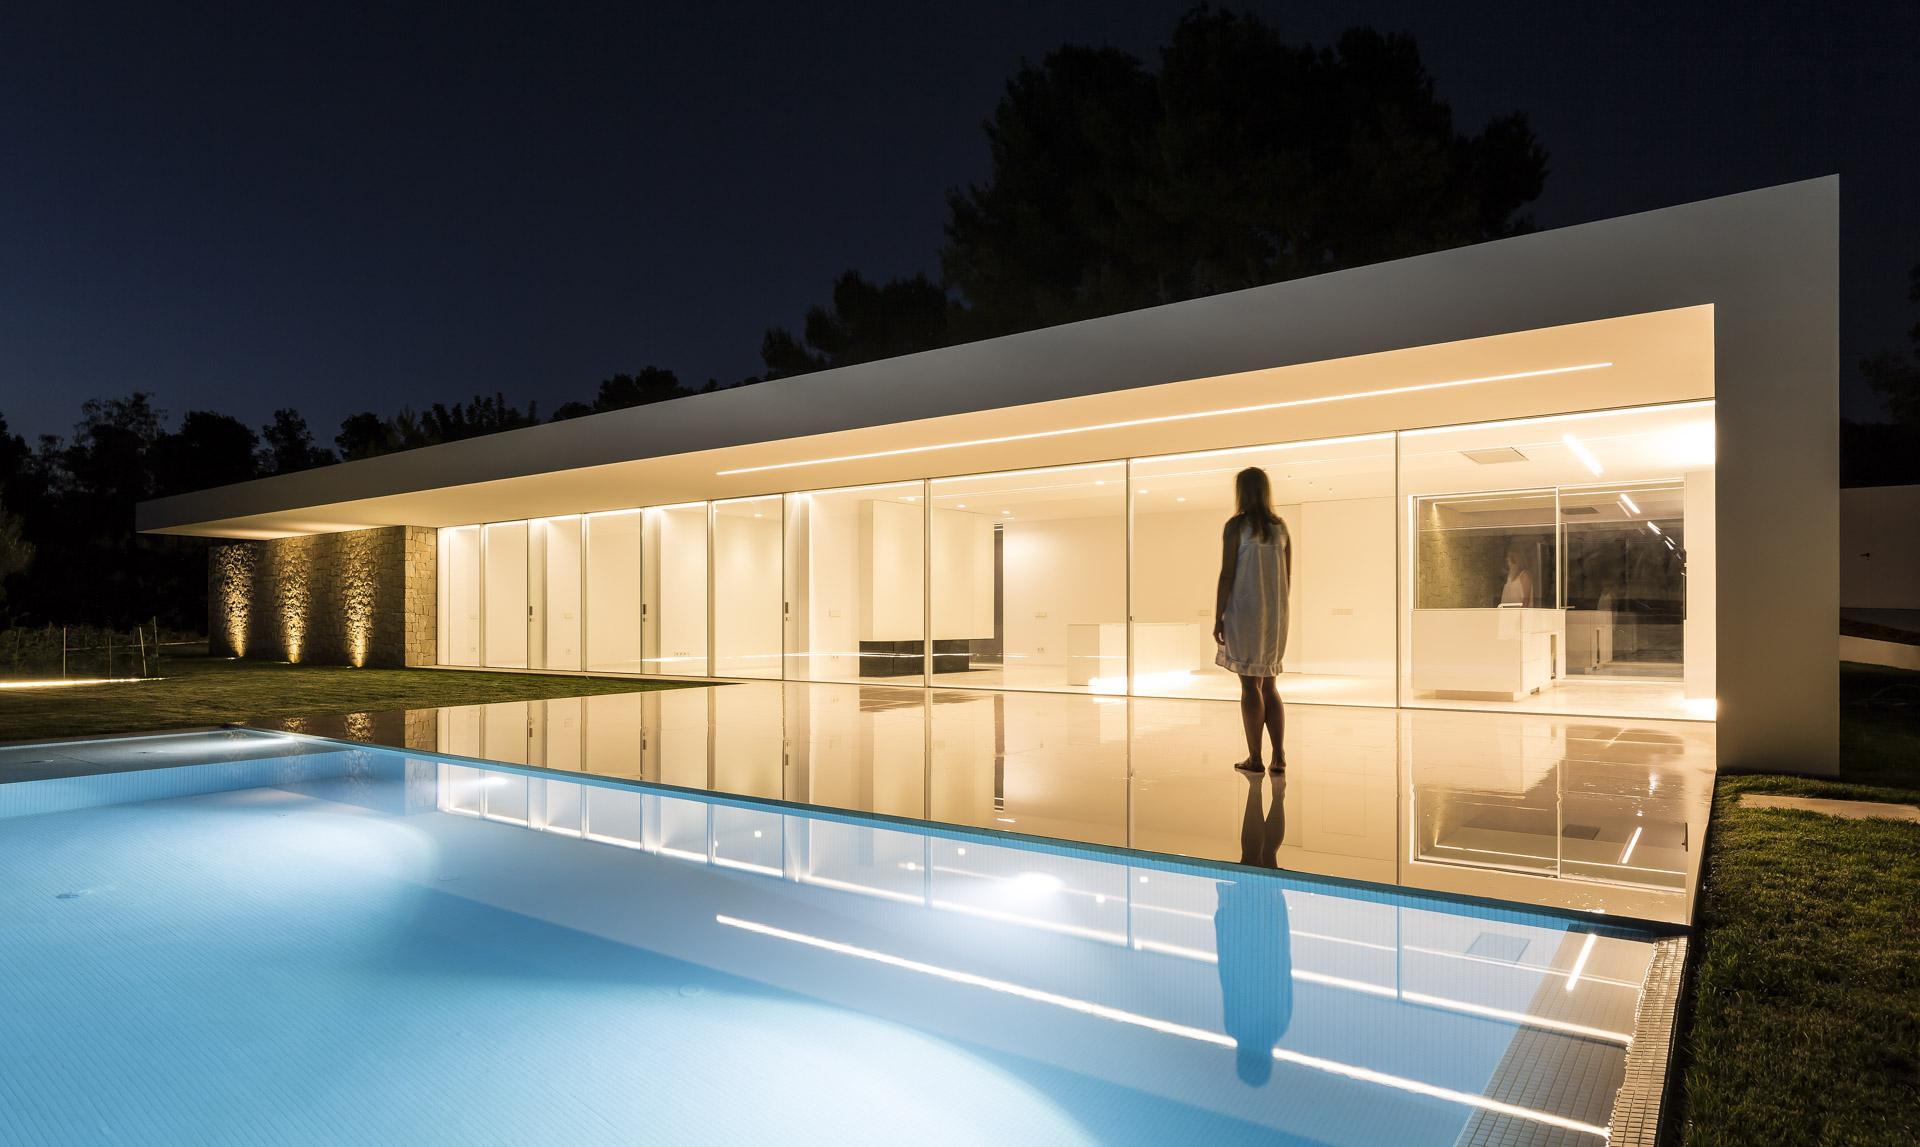 fotografia-arquitectura-valencia-german-cabo-gallardo-llopis-villamarchante-vivienda-67